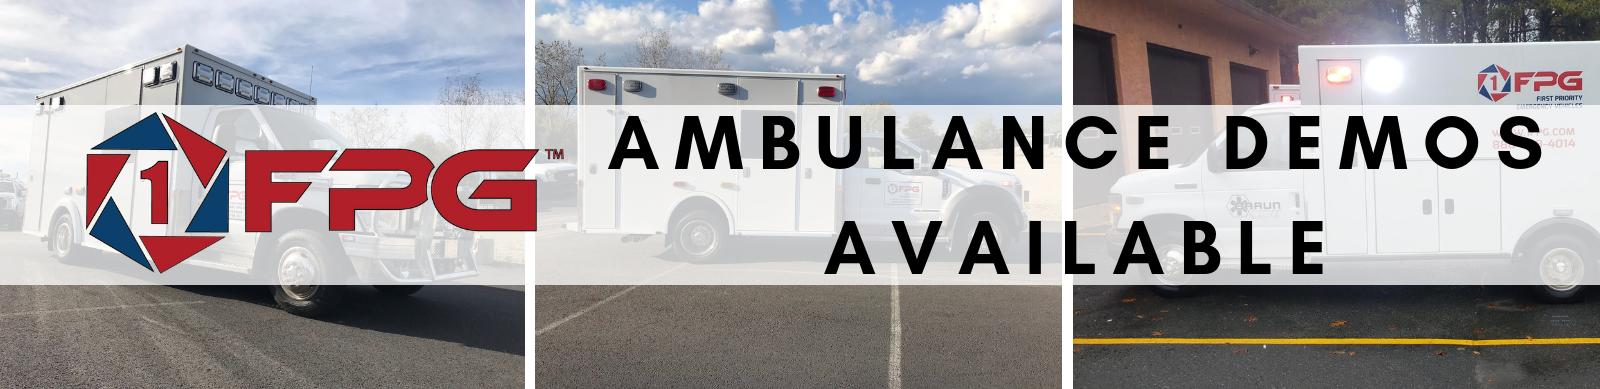 AmbulanceDemosAvailableBanner.png